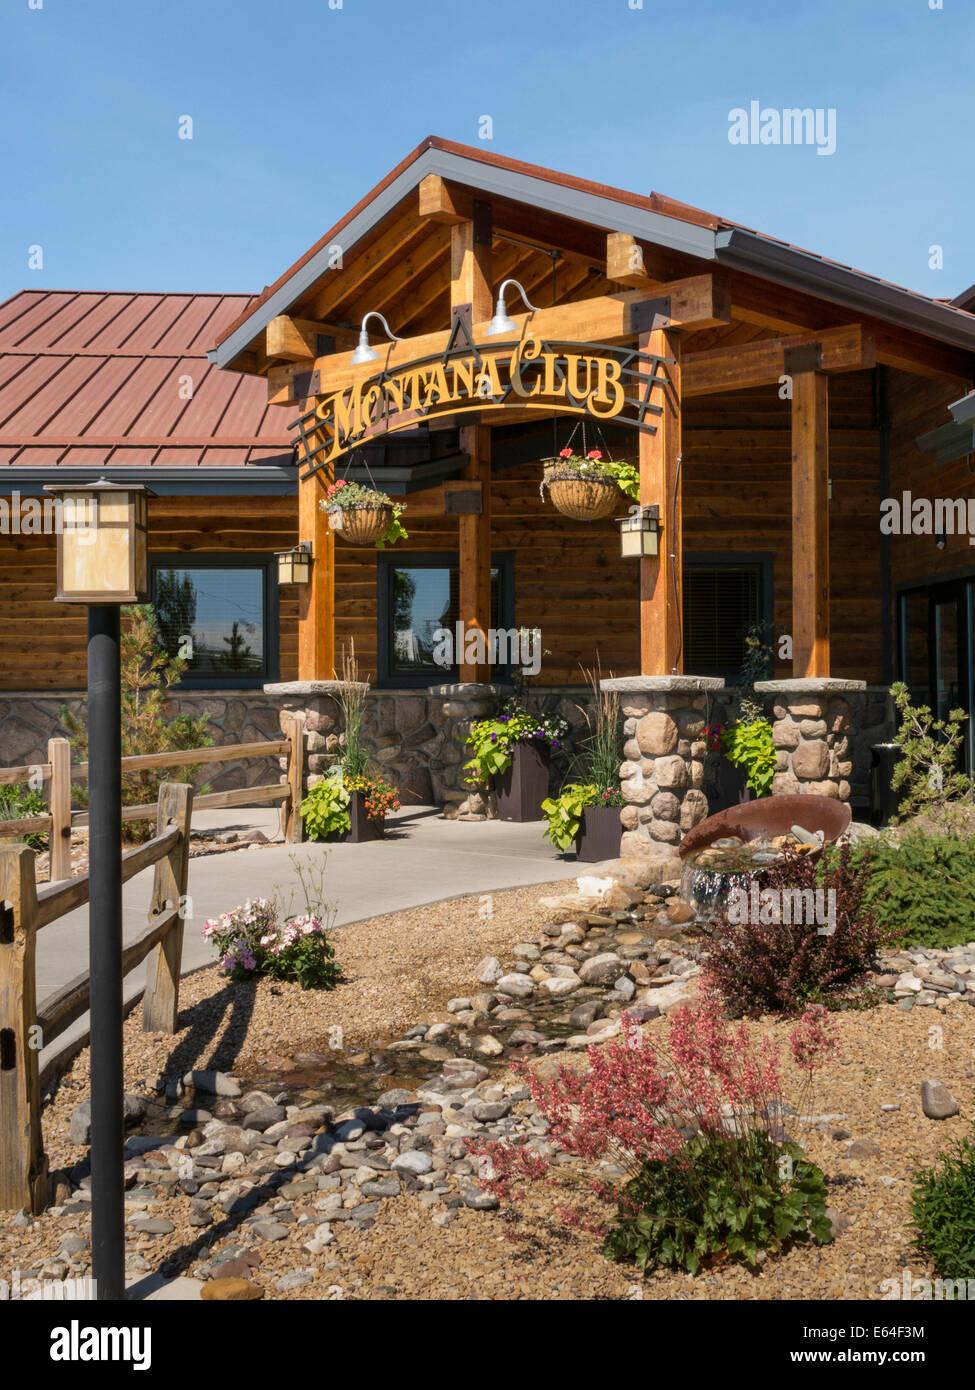 Casinos In Great Falls Montana